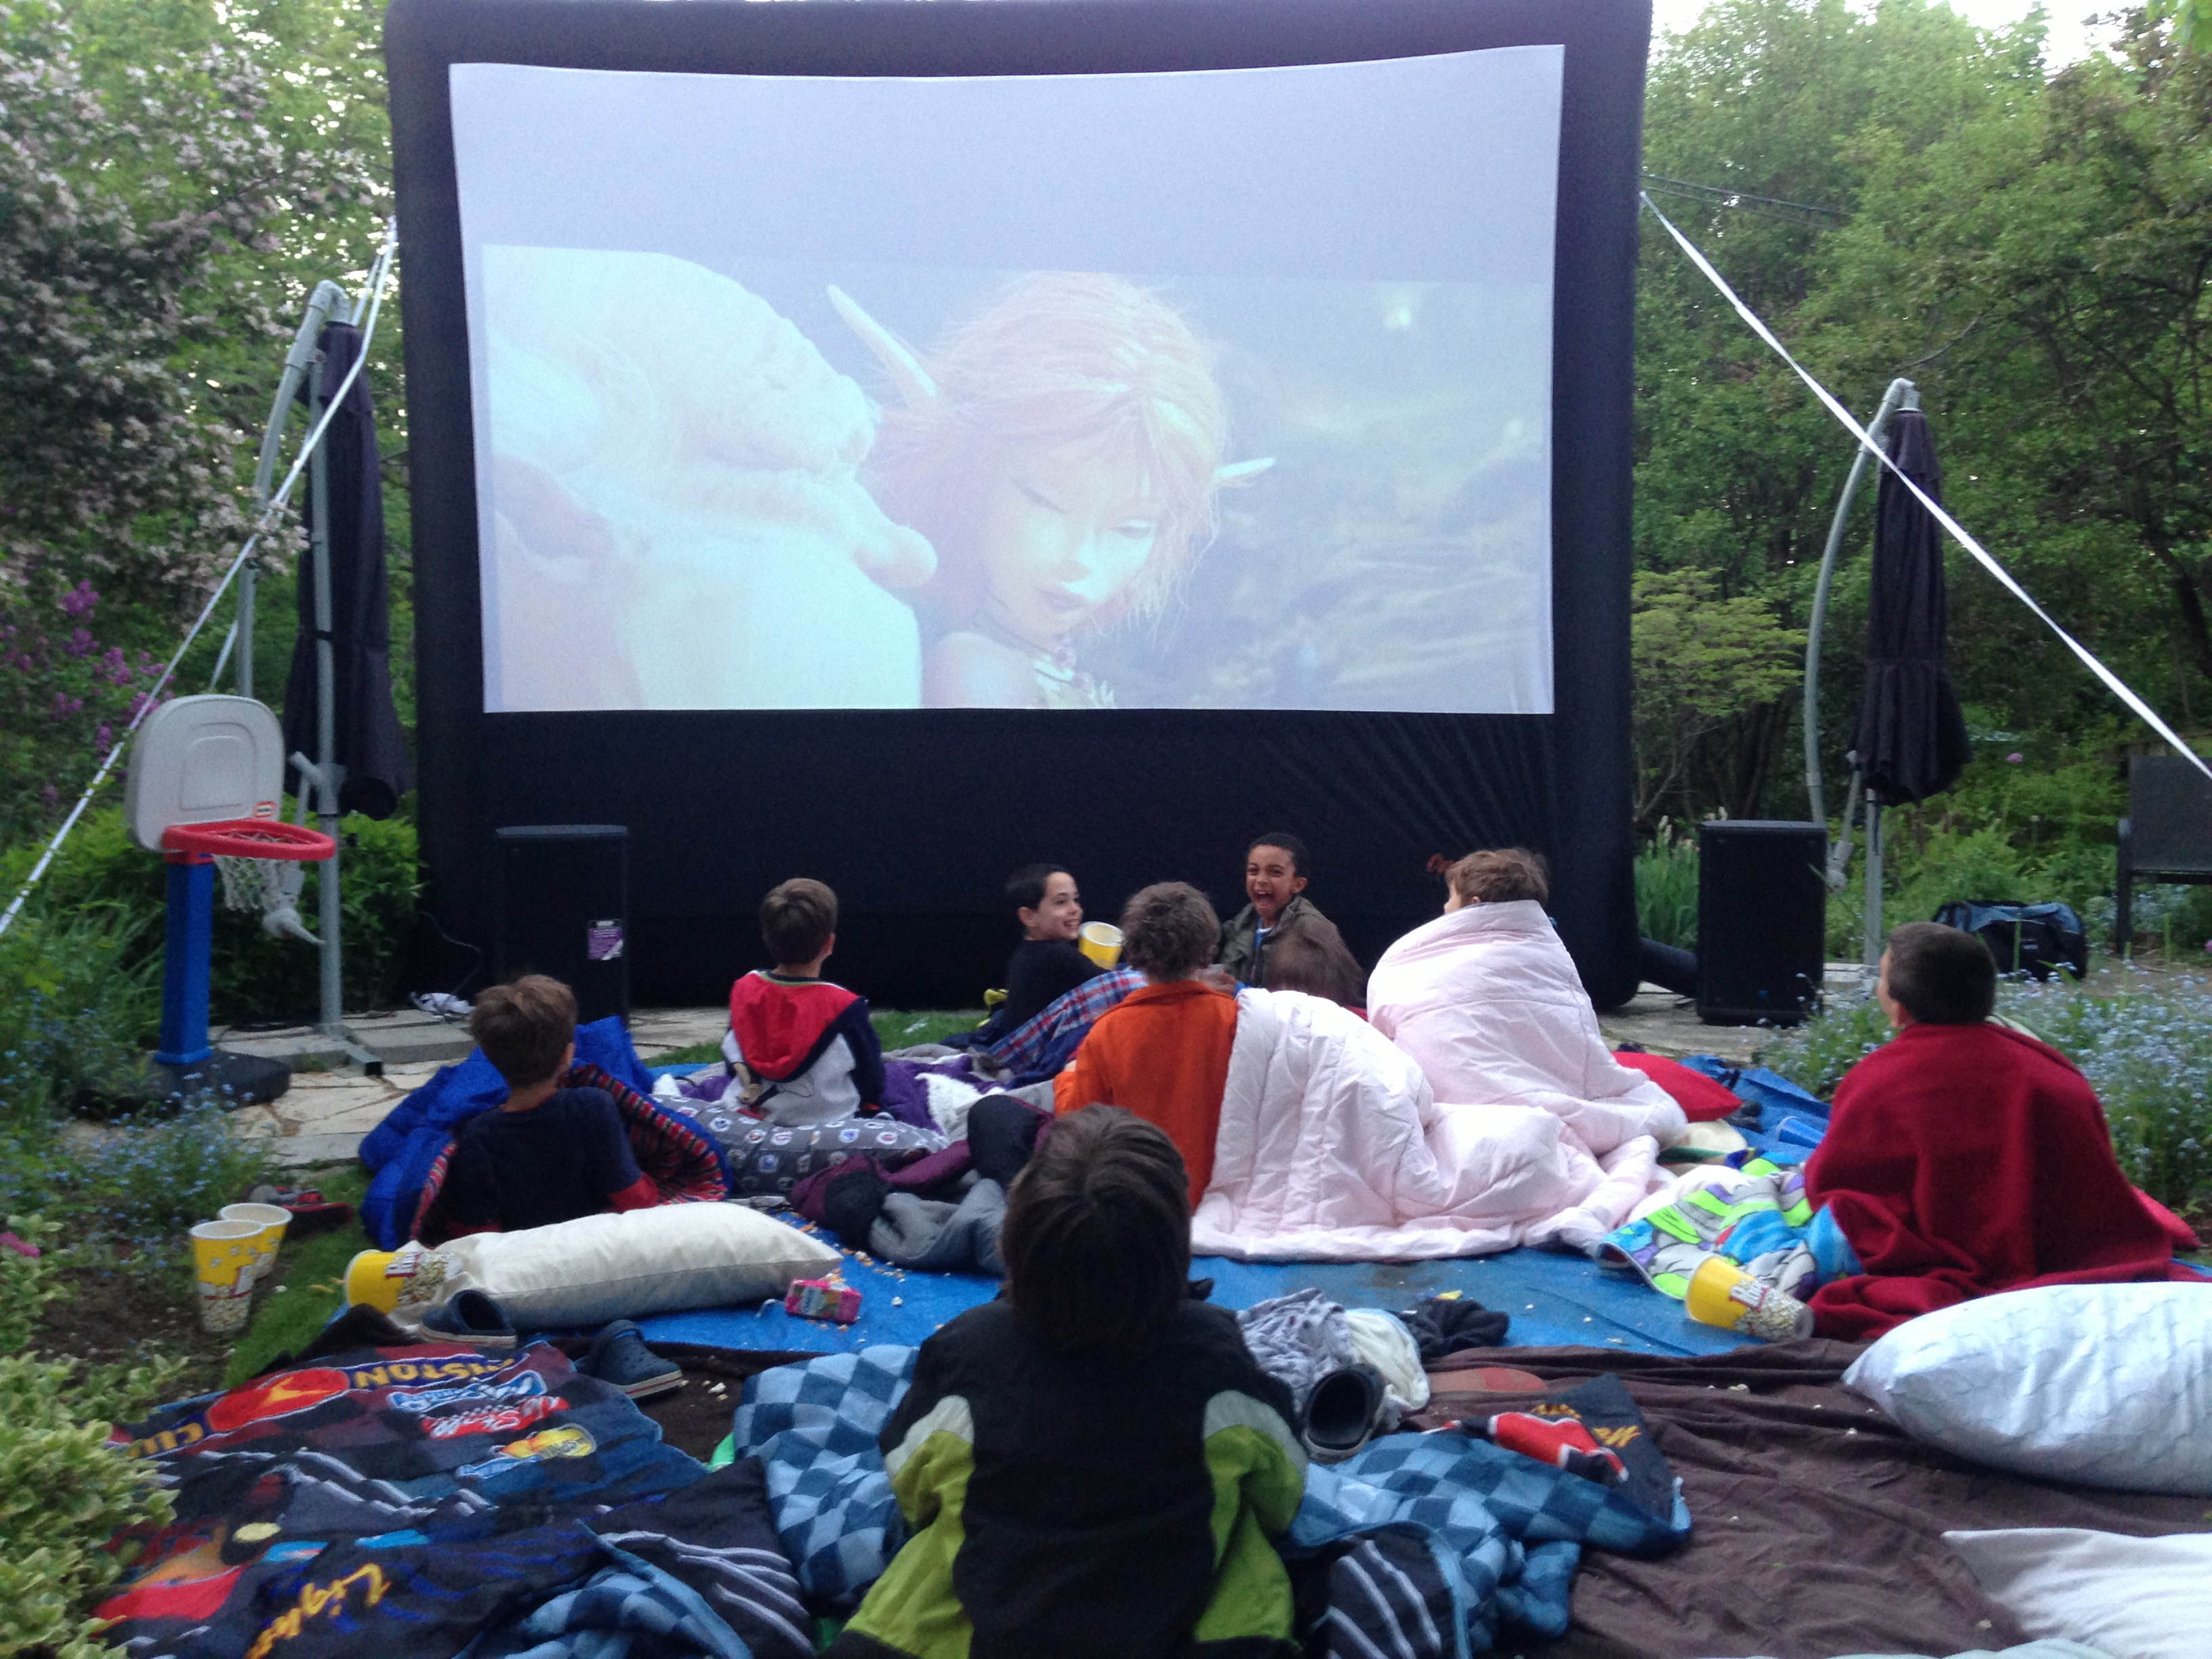 airscreen inflatable outdoor movie screen sales u0026 rentals canada